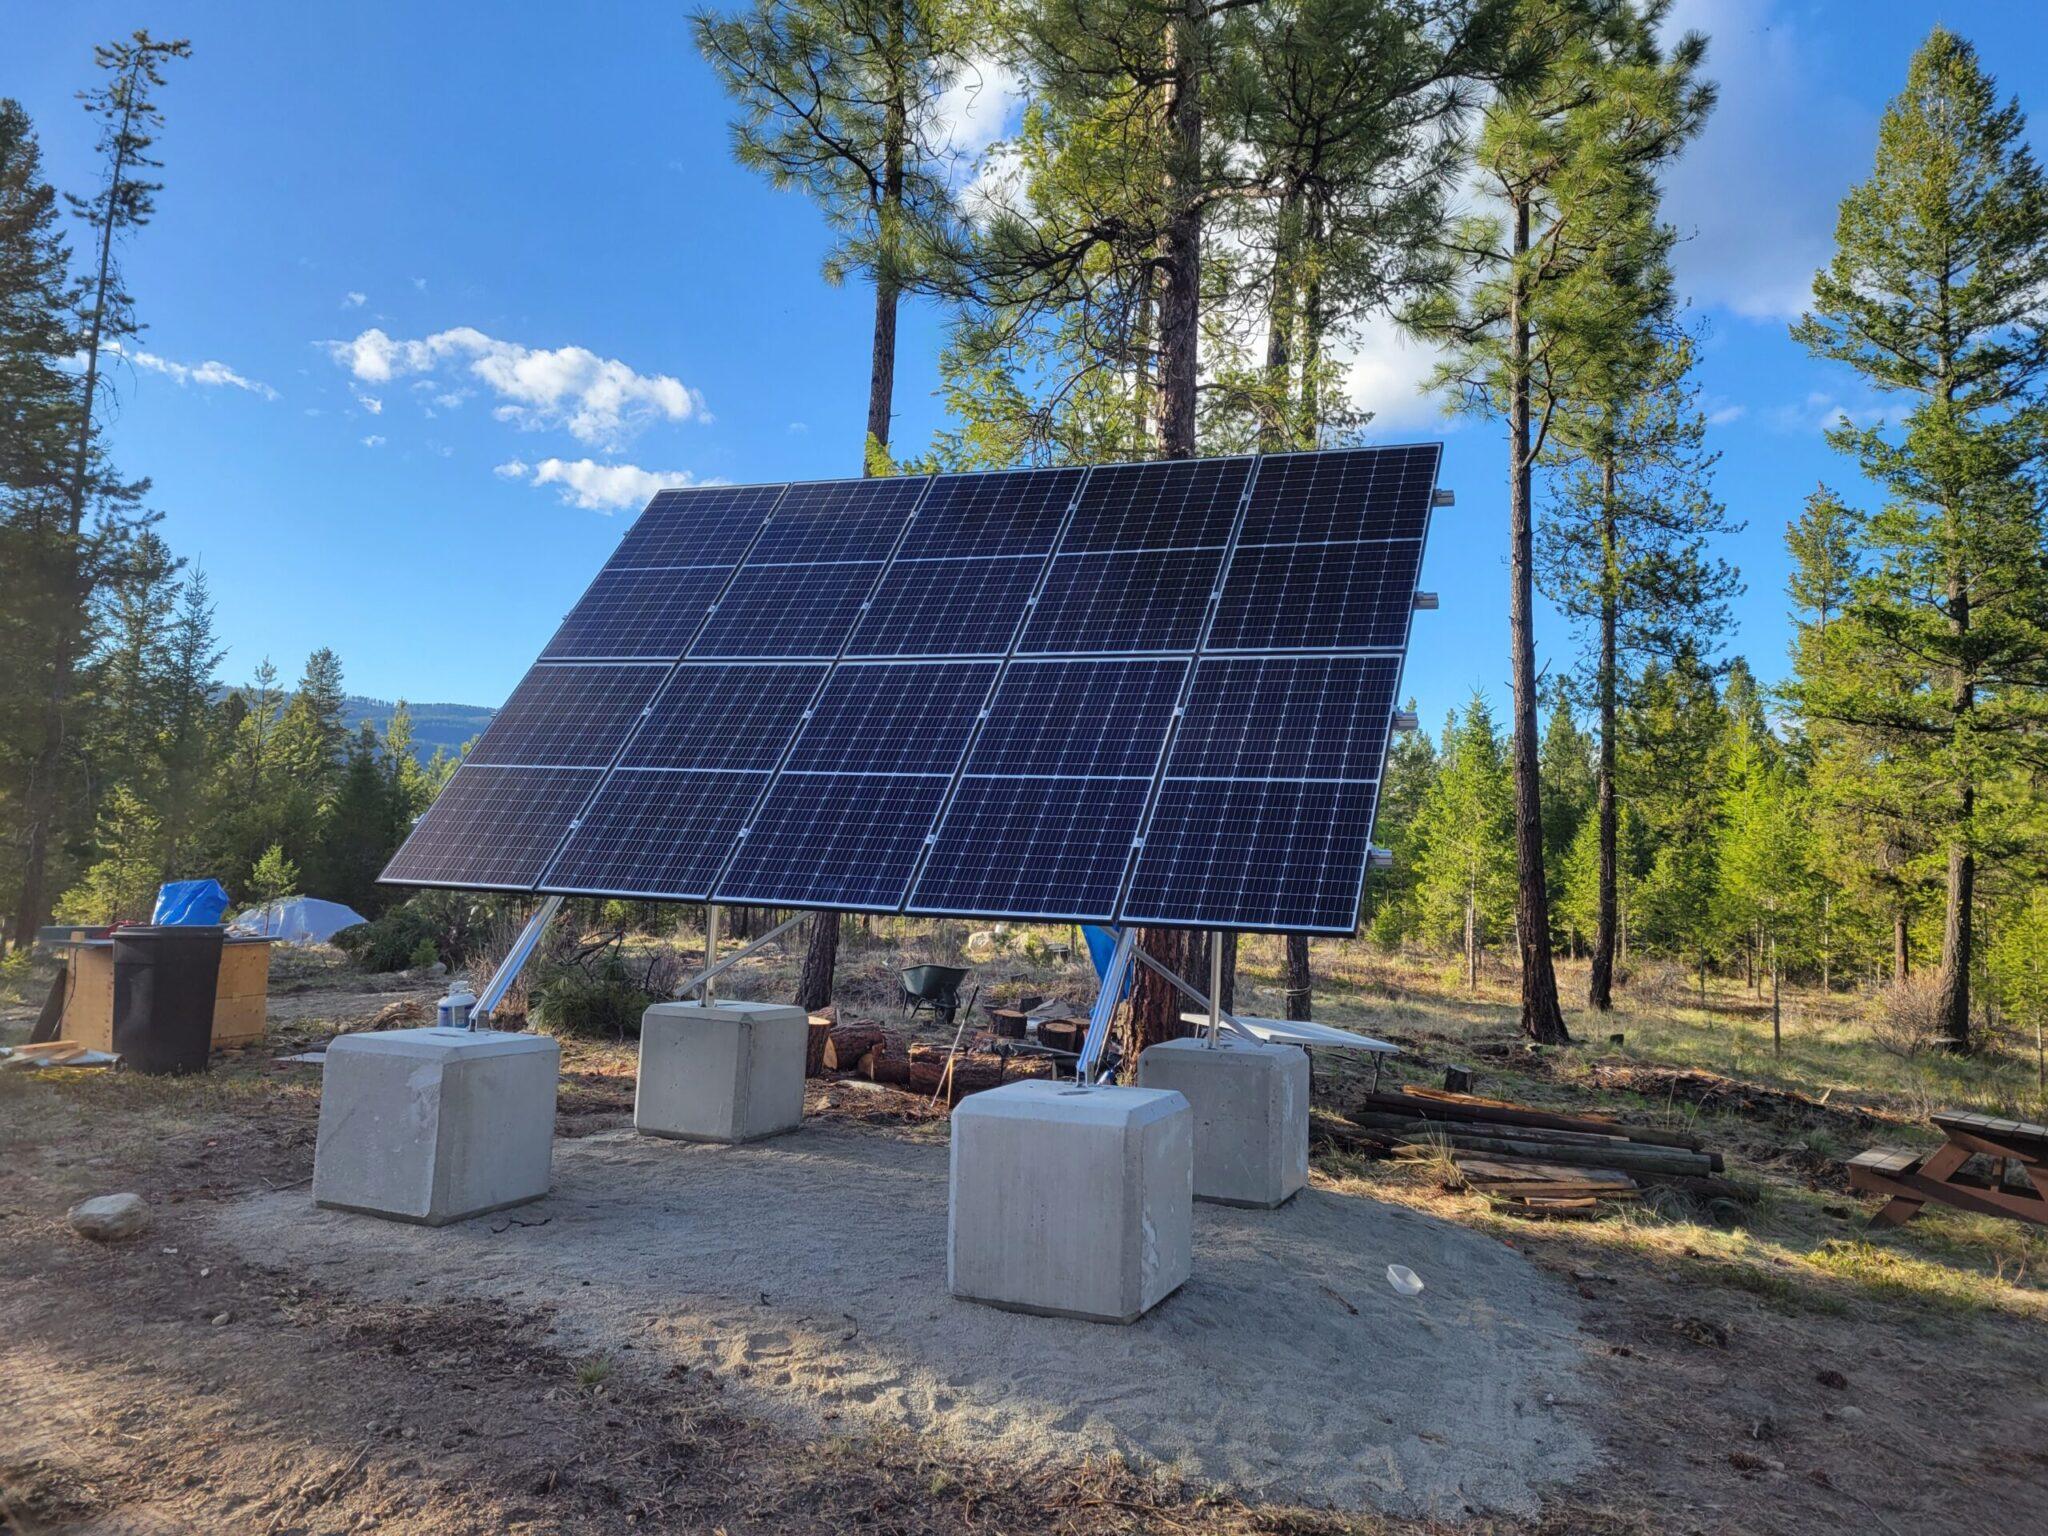 TATA Creek – Complete off grid system